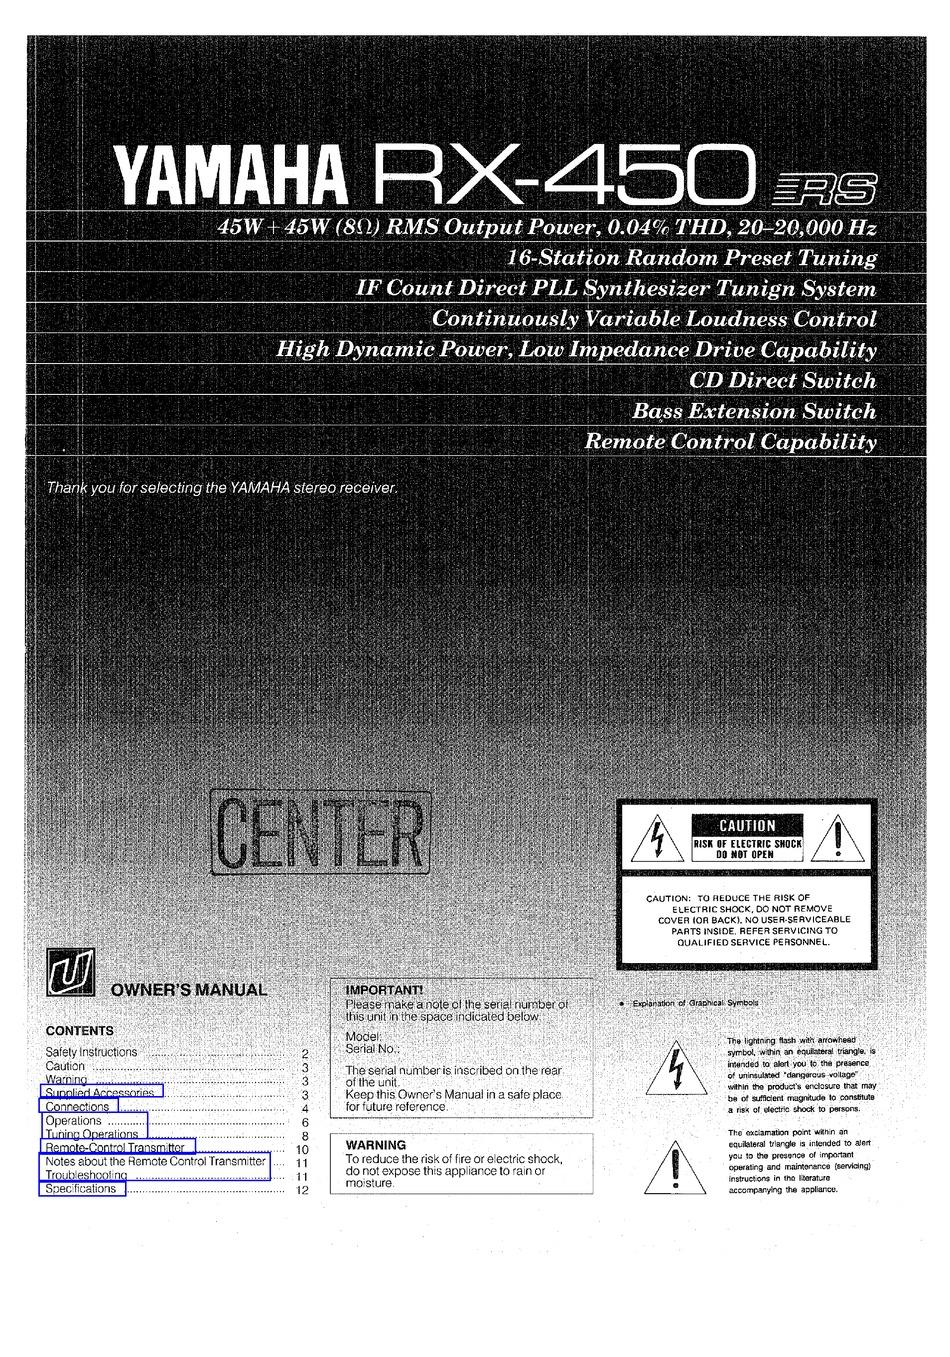 Yamaha Rx 450 Owner S Manual Pdf Download Manualslib